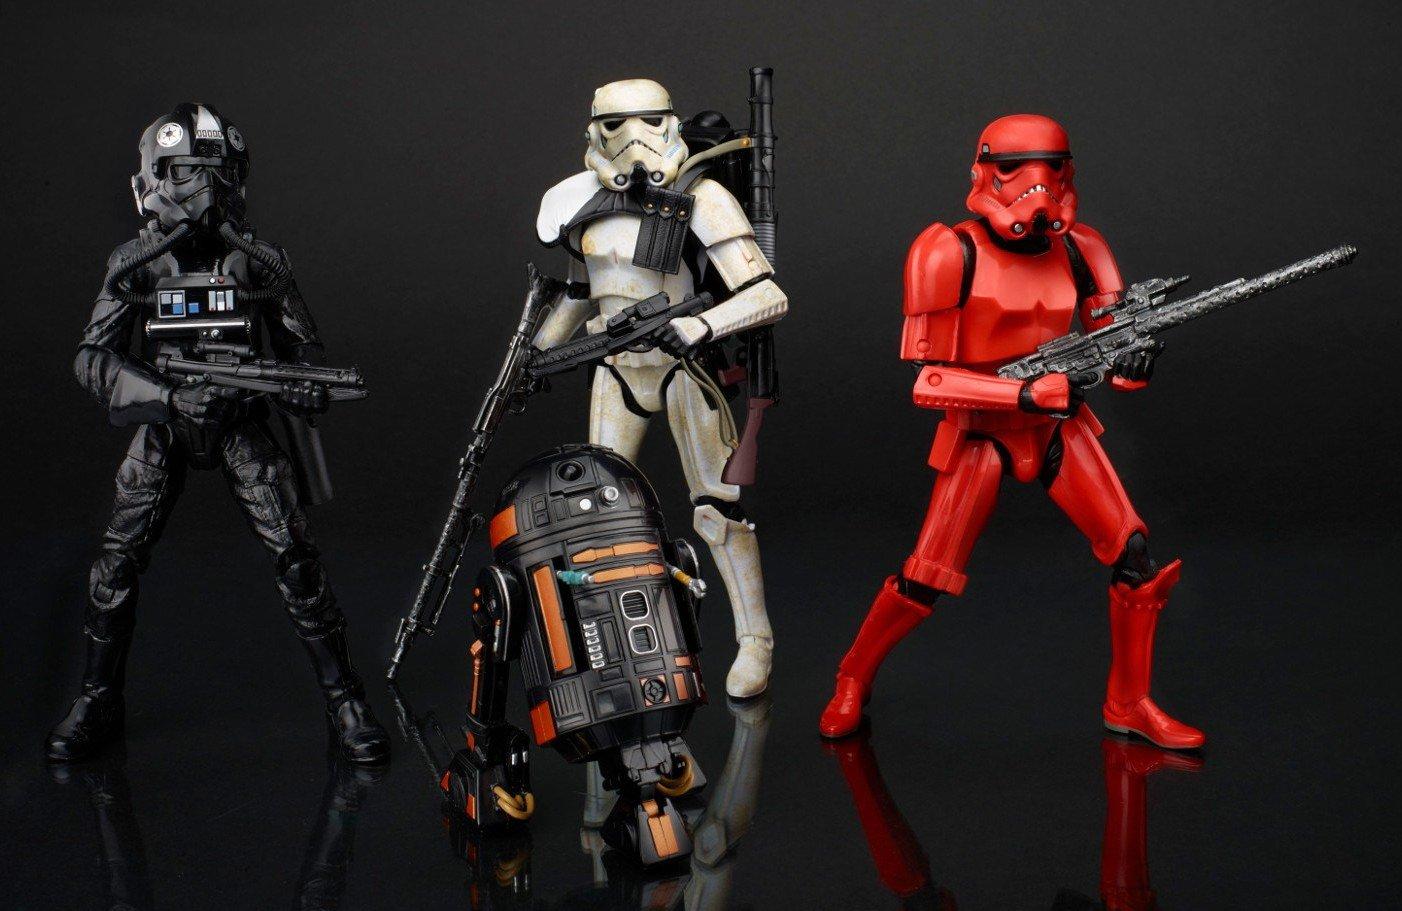 Star-Wars-Black-Series-Imperial-Forces-Exclusive-4-Pack-R2-Q5-Crimson-Trooper-e1441857794541